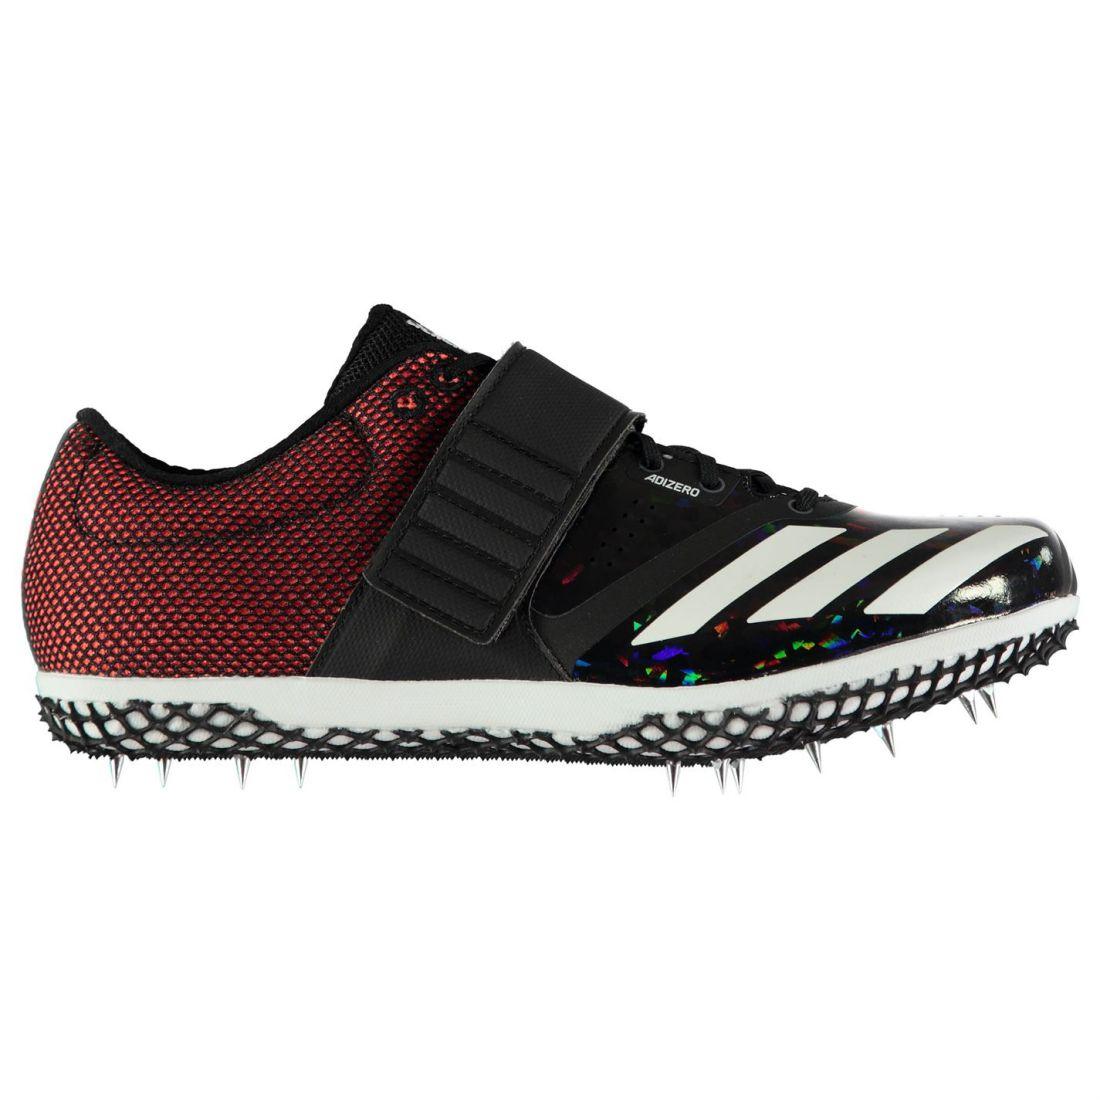 adidas adizero High Jump Spikes Mens Gents Track Running Shoes ... 4d98d7872